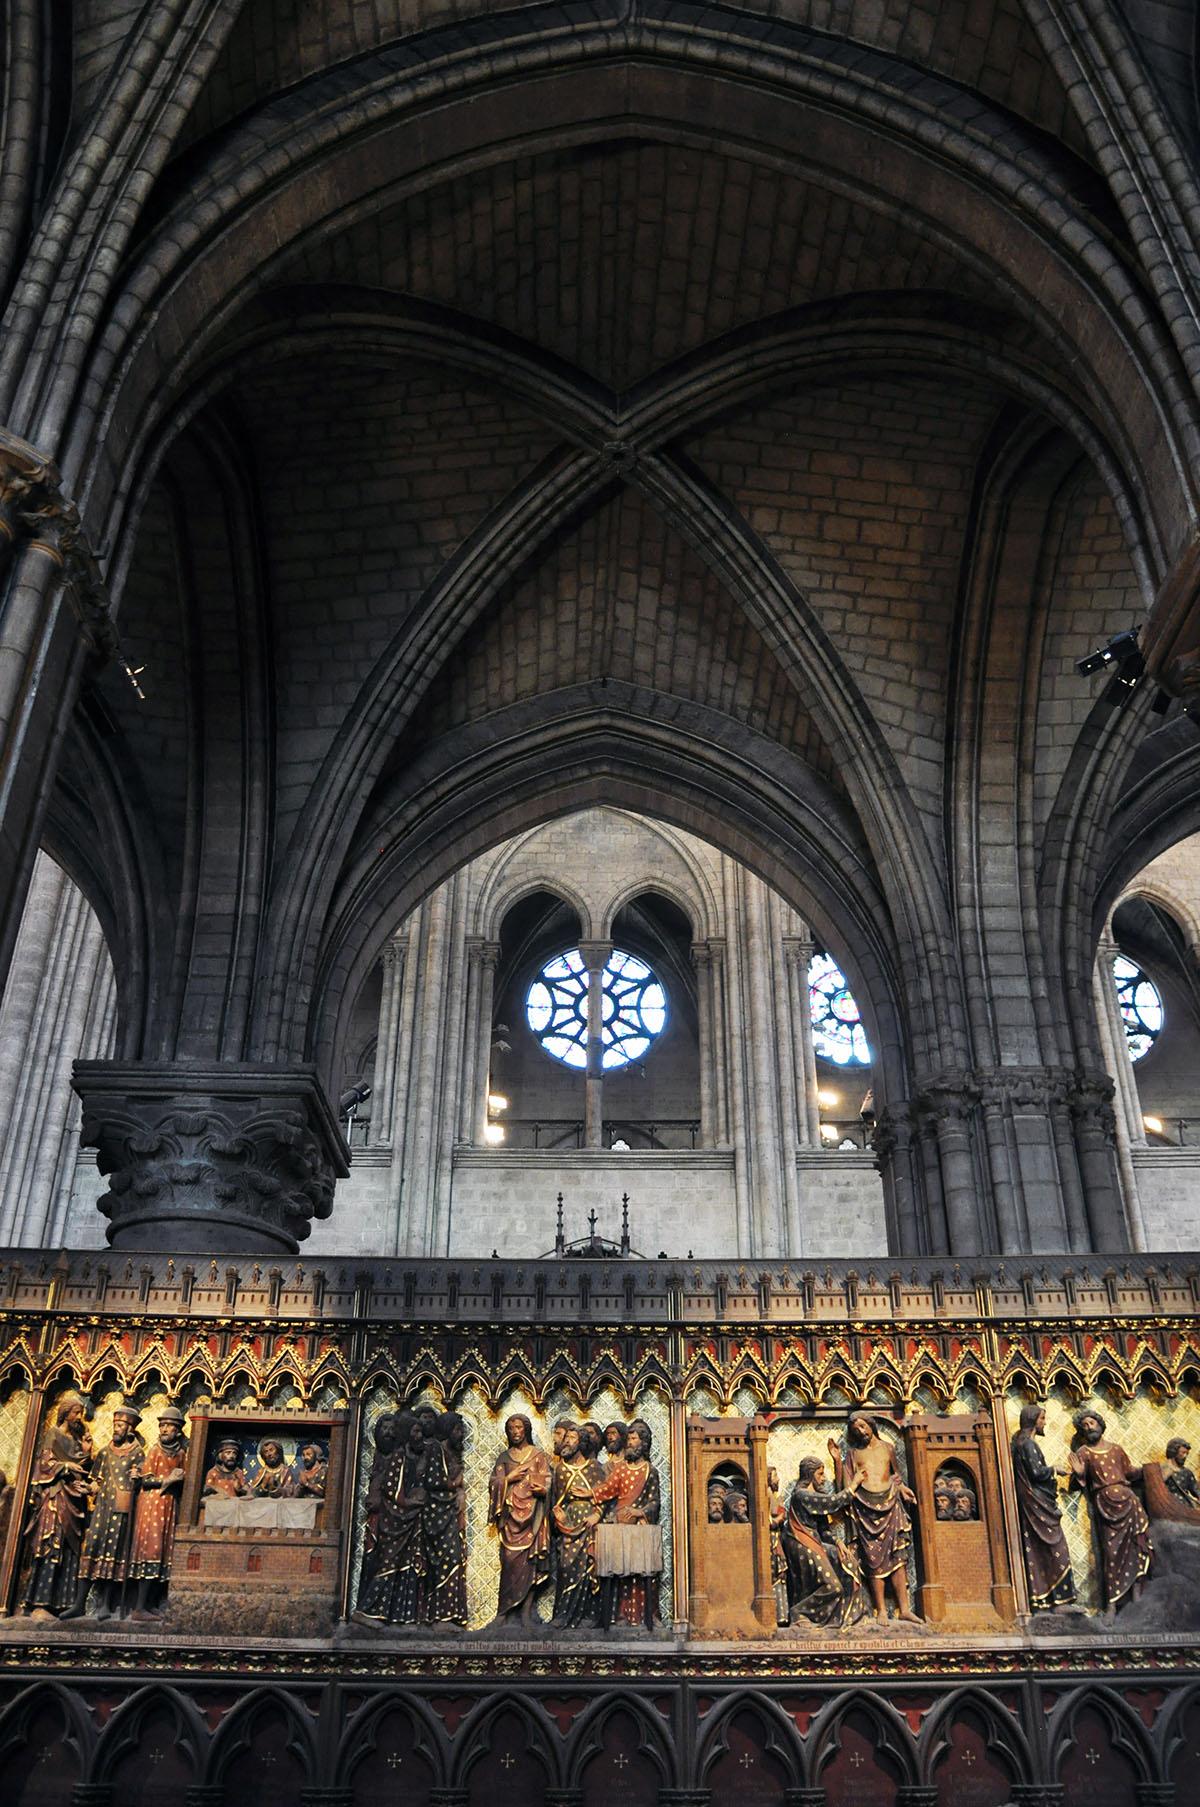 Notre Dame Cathedral Interior 02 June 2010 photo by Bob Borson